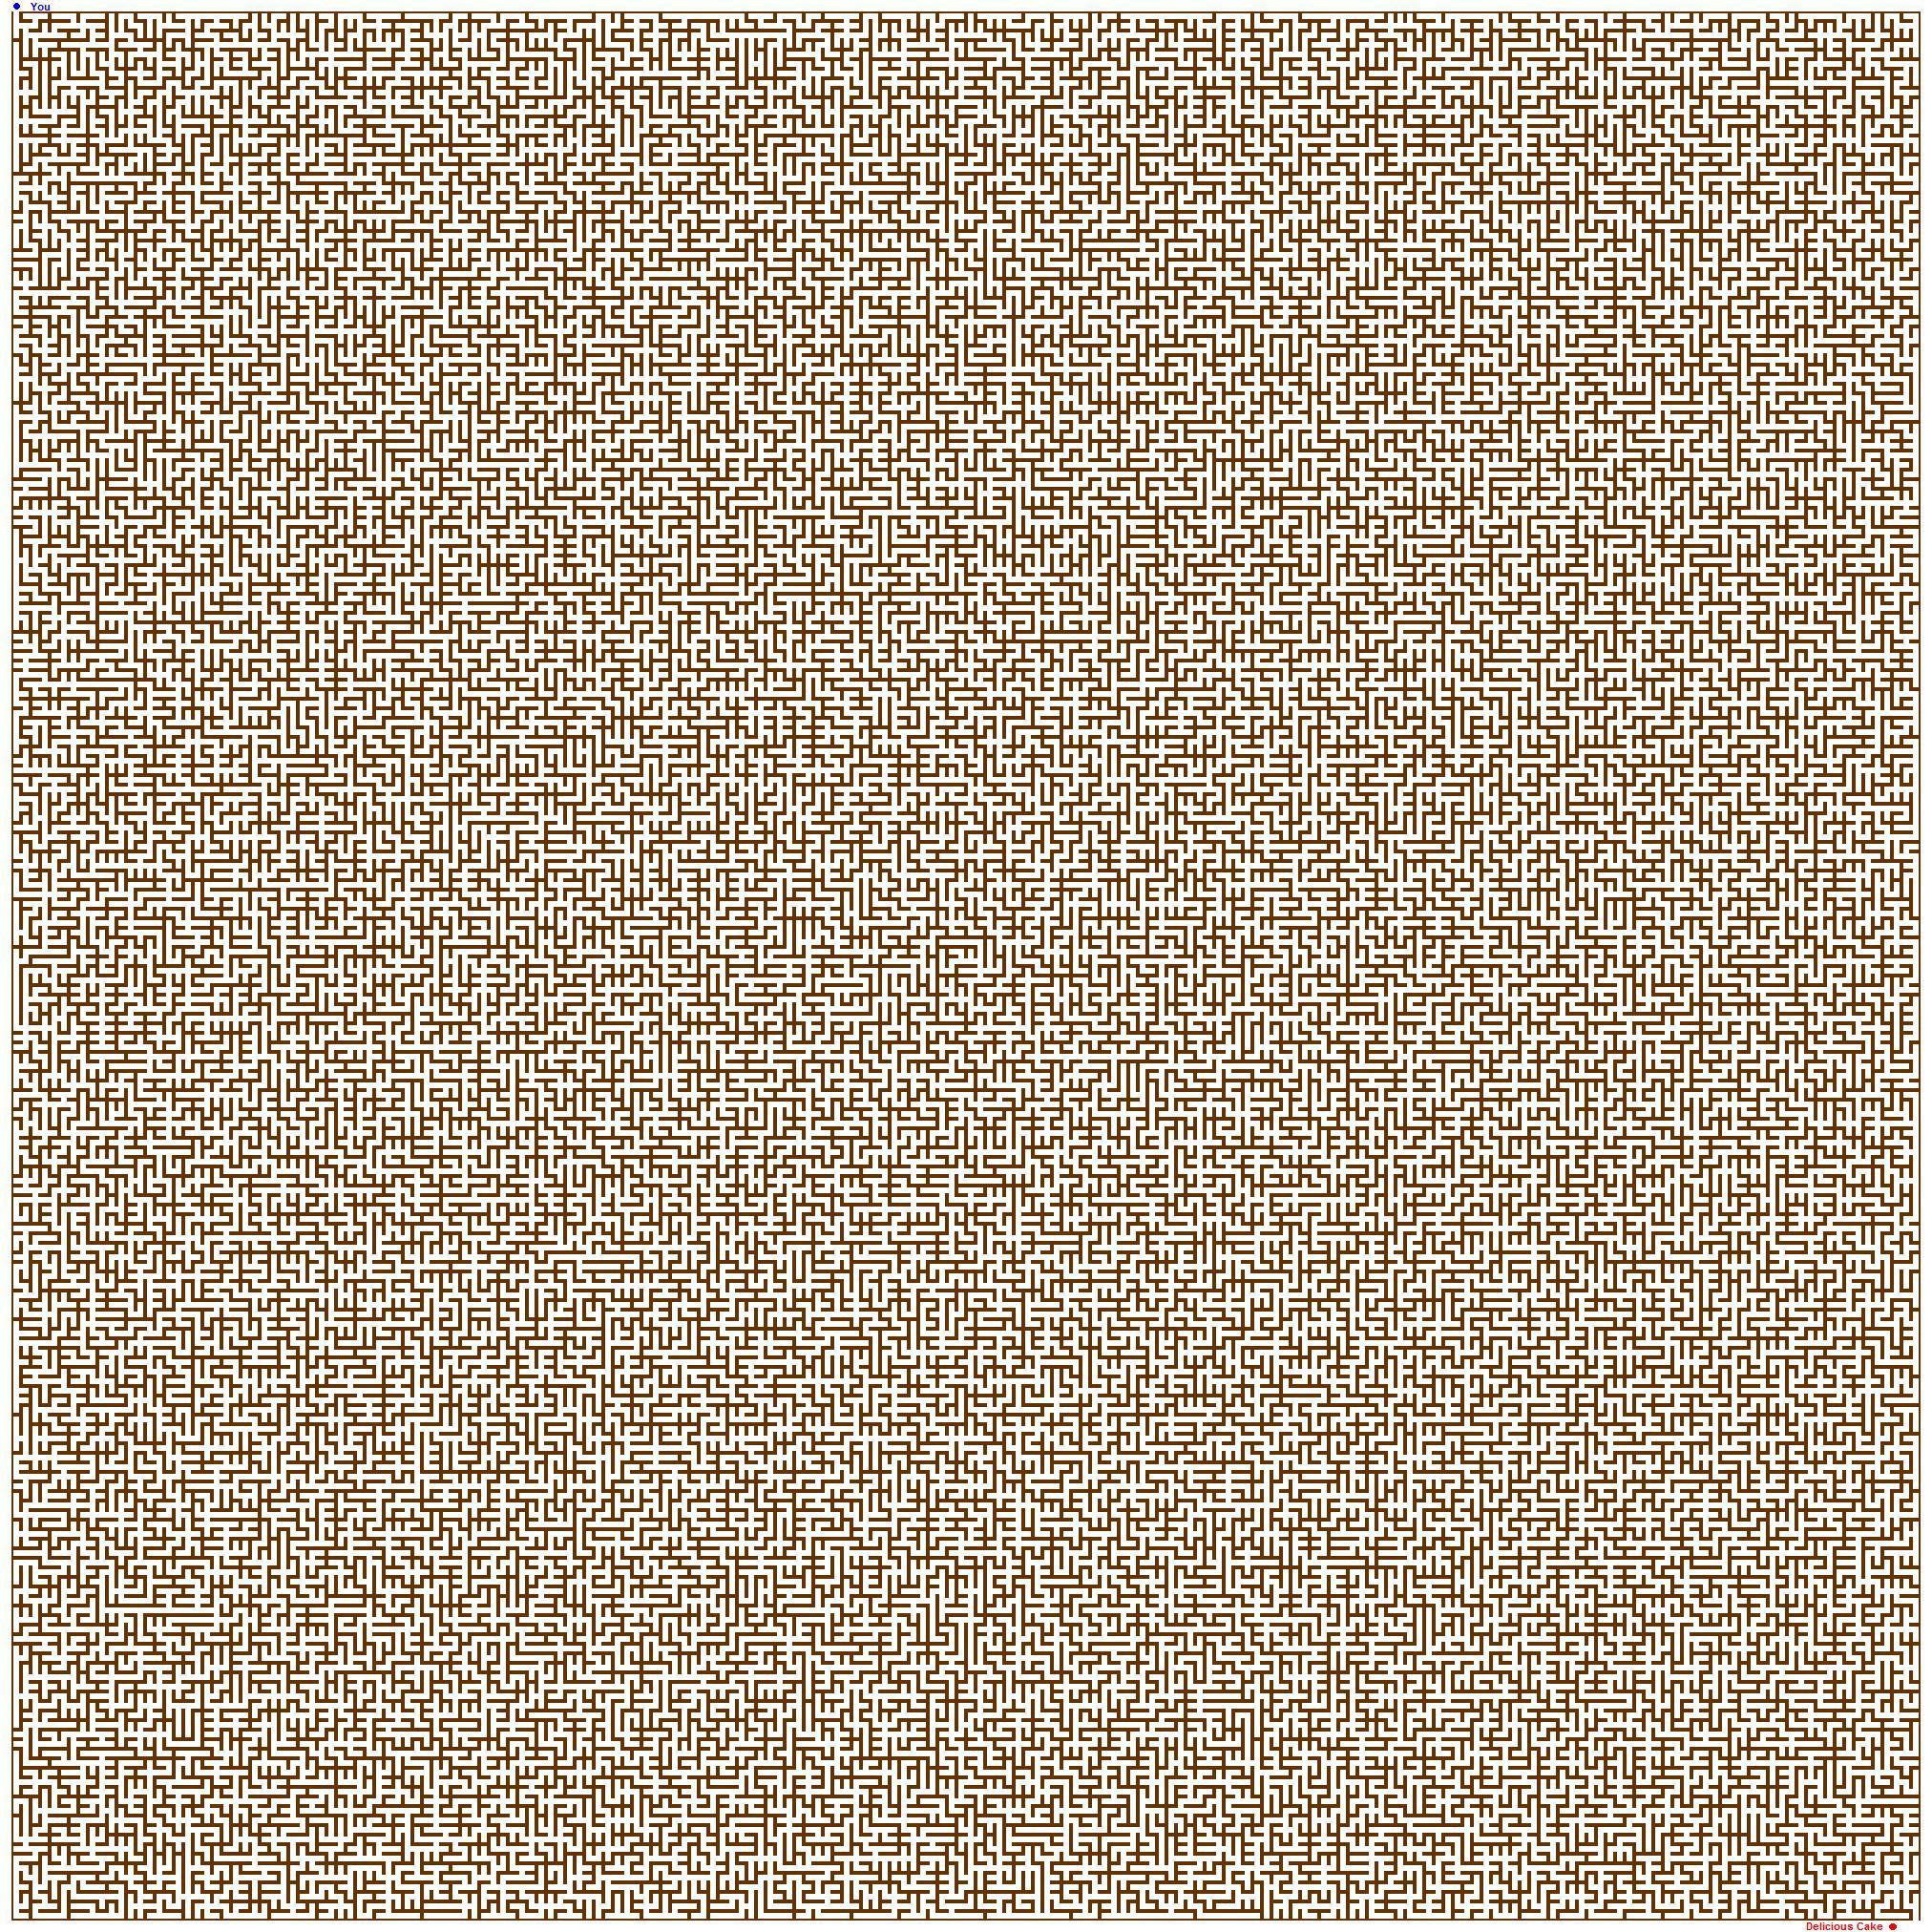 http://taint.org/x/2007/cake-maze.jpg